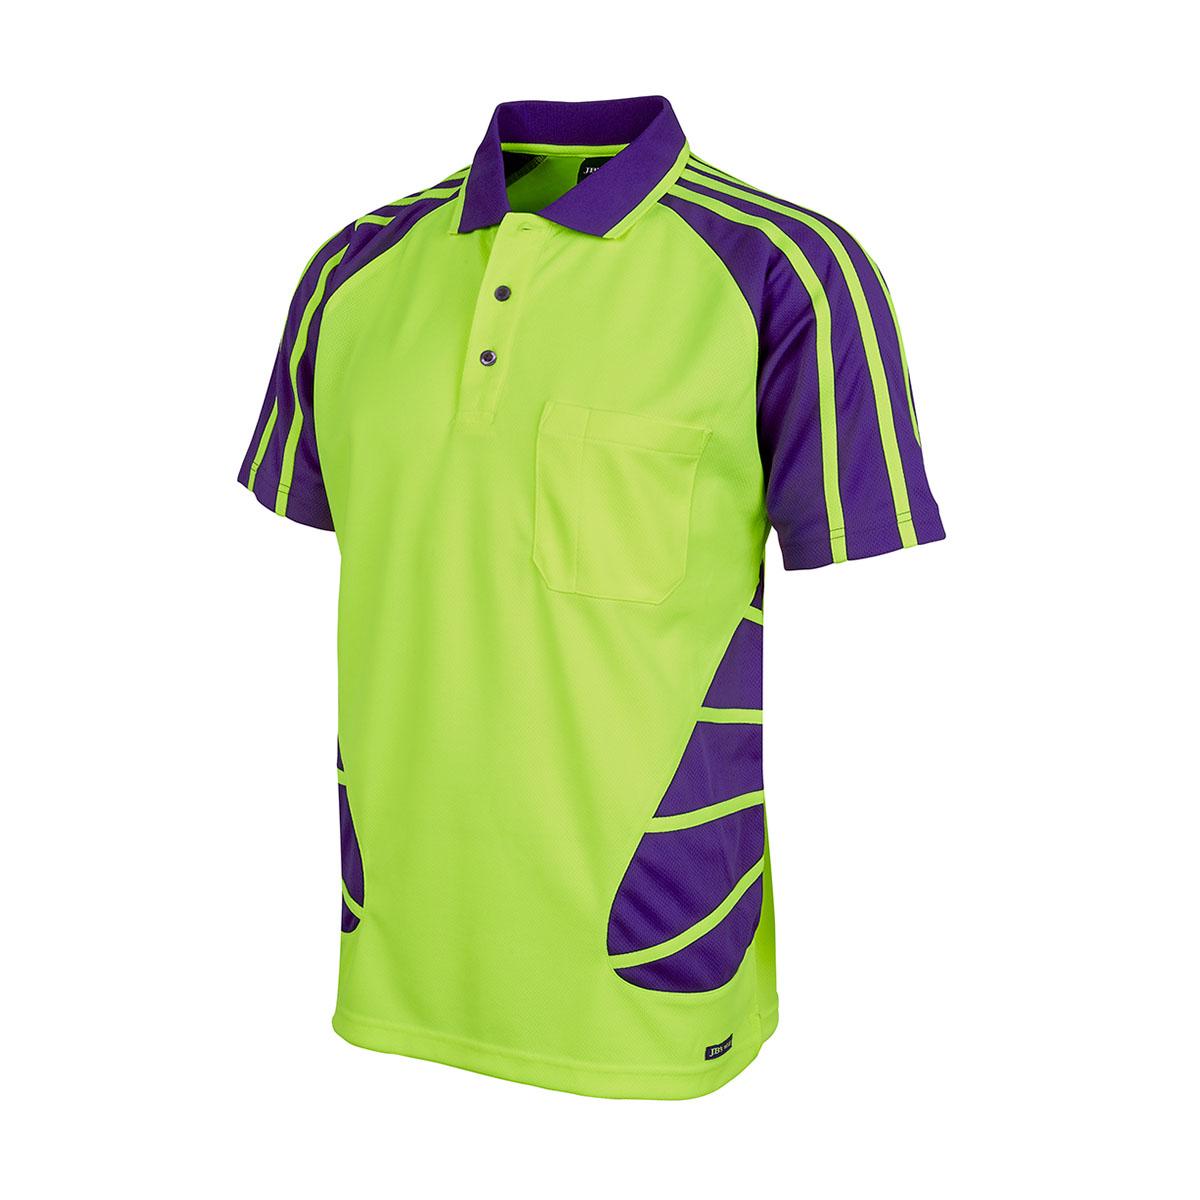 Hi Vis S/S Spider Polo-Lime  /  Purple